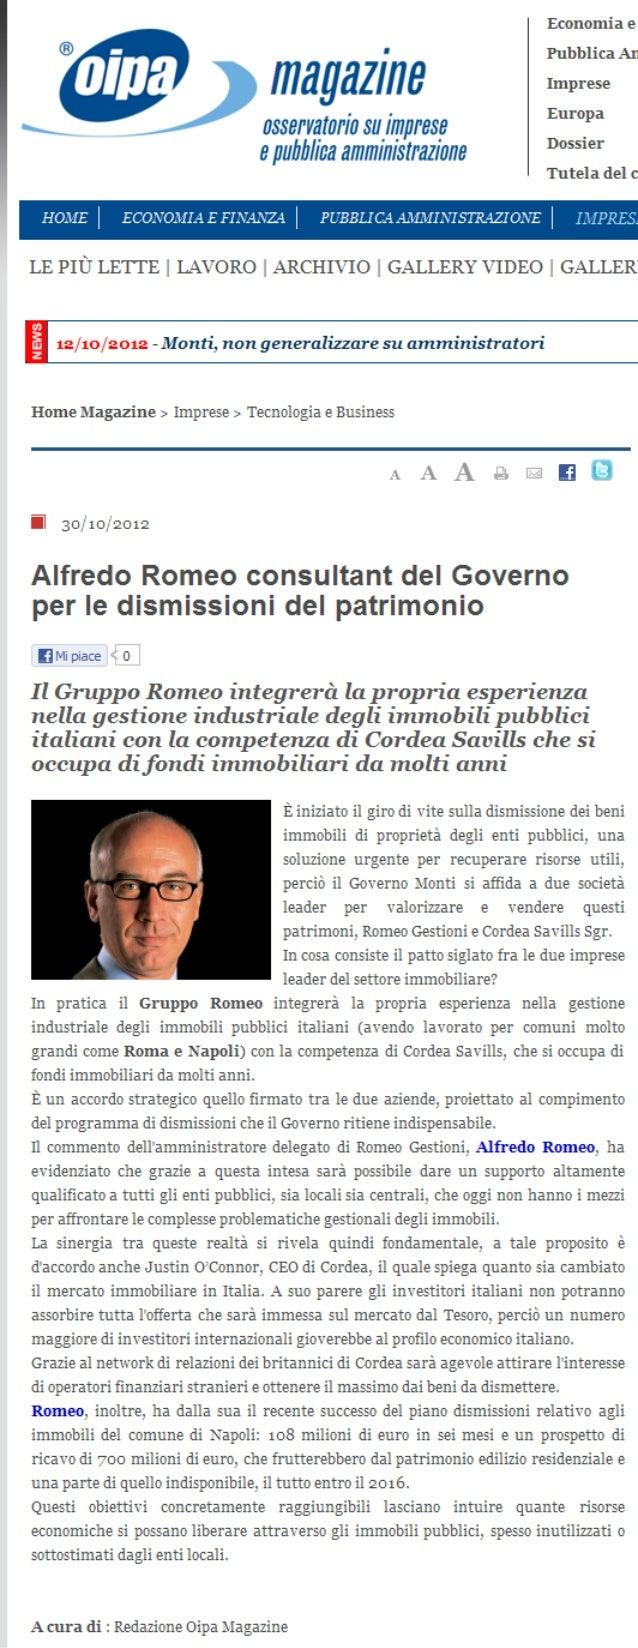 Alfredo Romeo - rassegna stampa Oipa